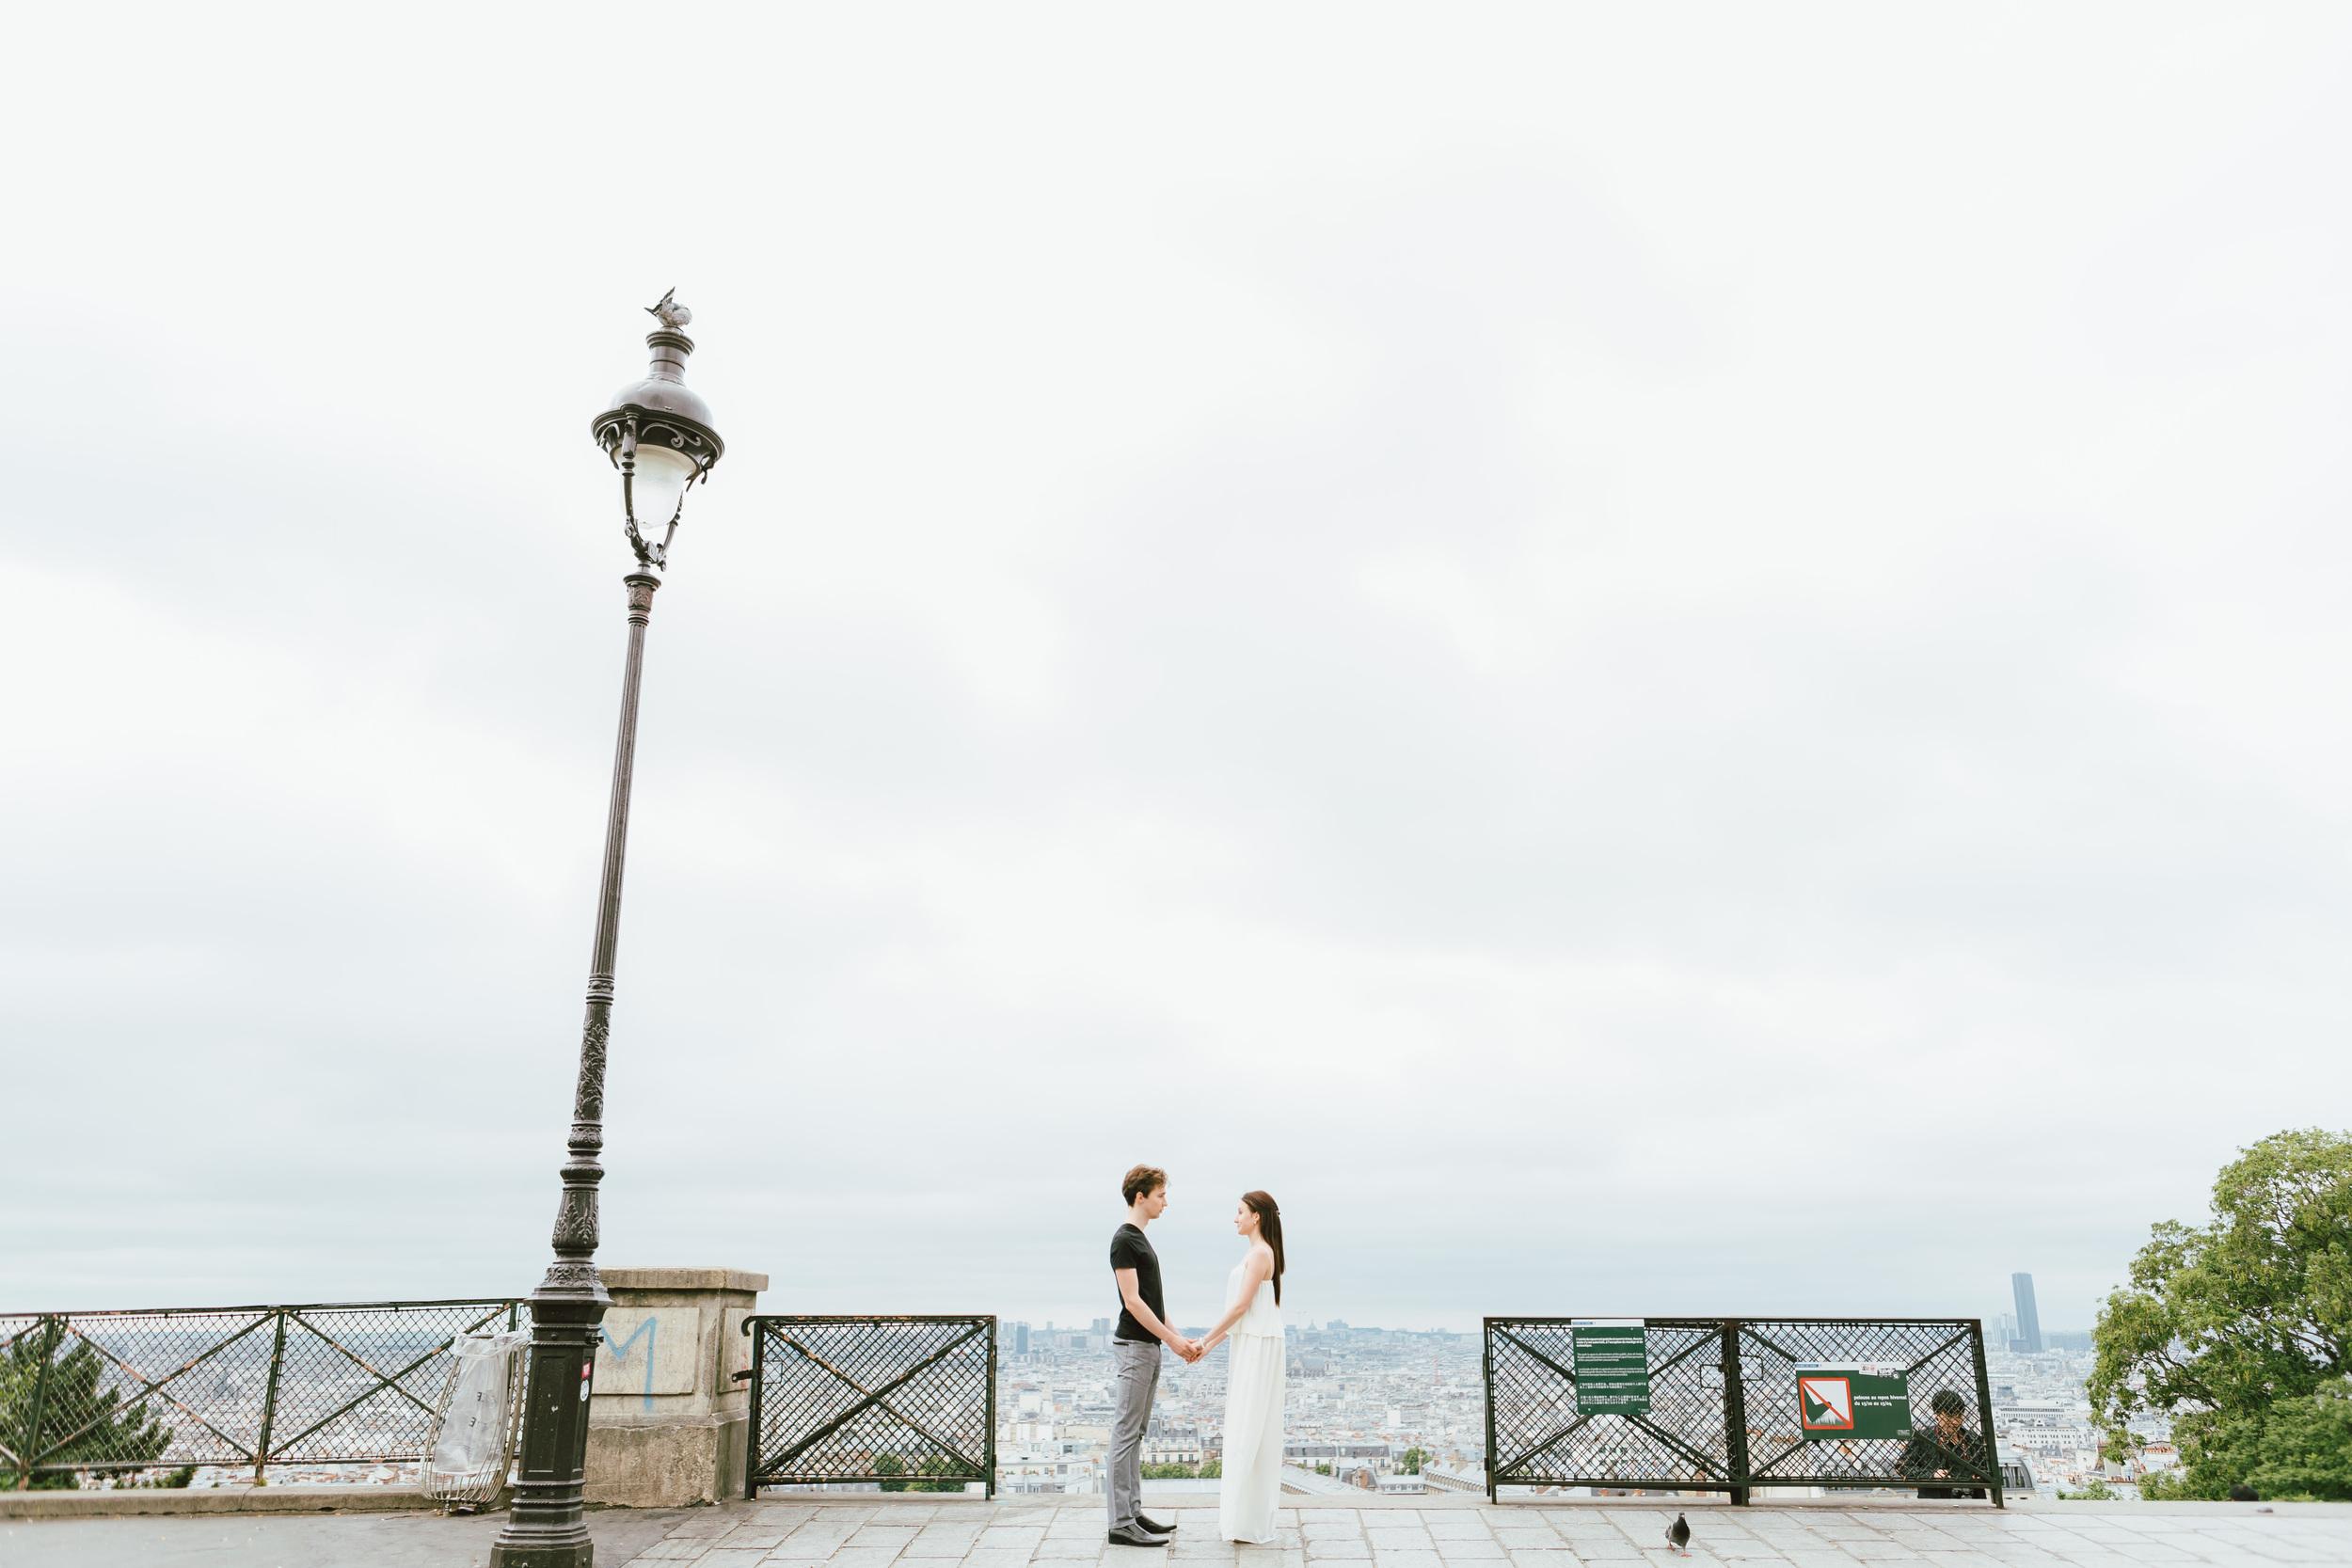 Photographer in Paris, Montmartre, Lovestory, sacre coeur, iheartparisfr